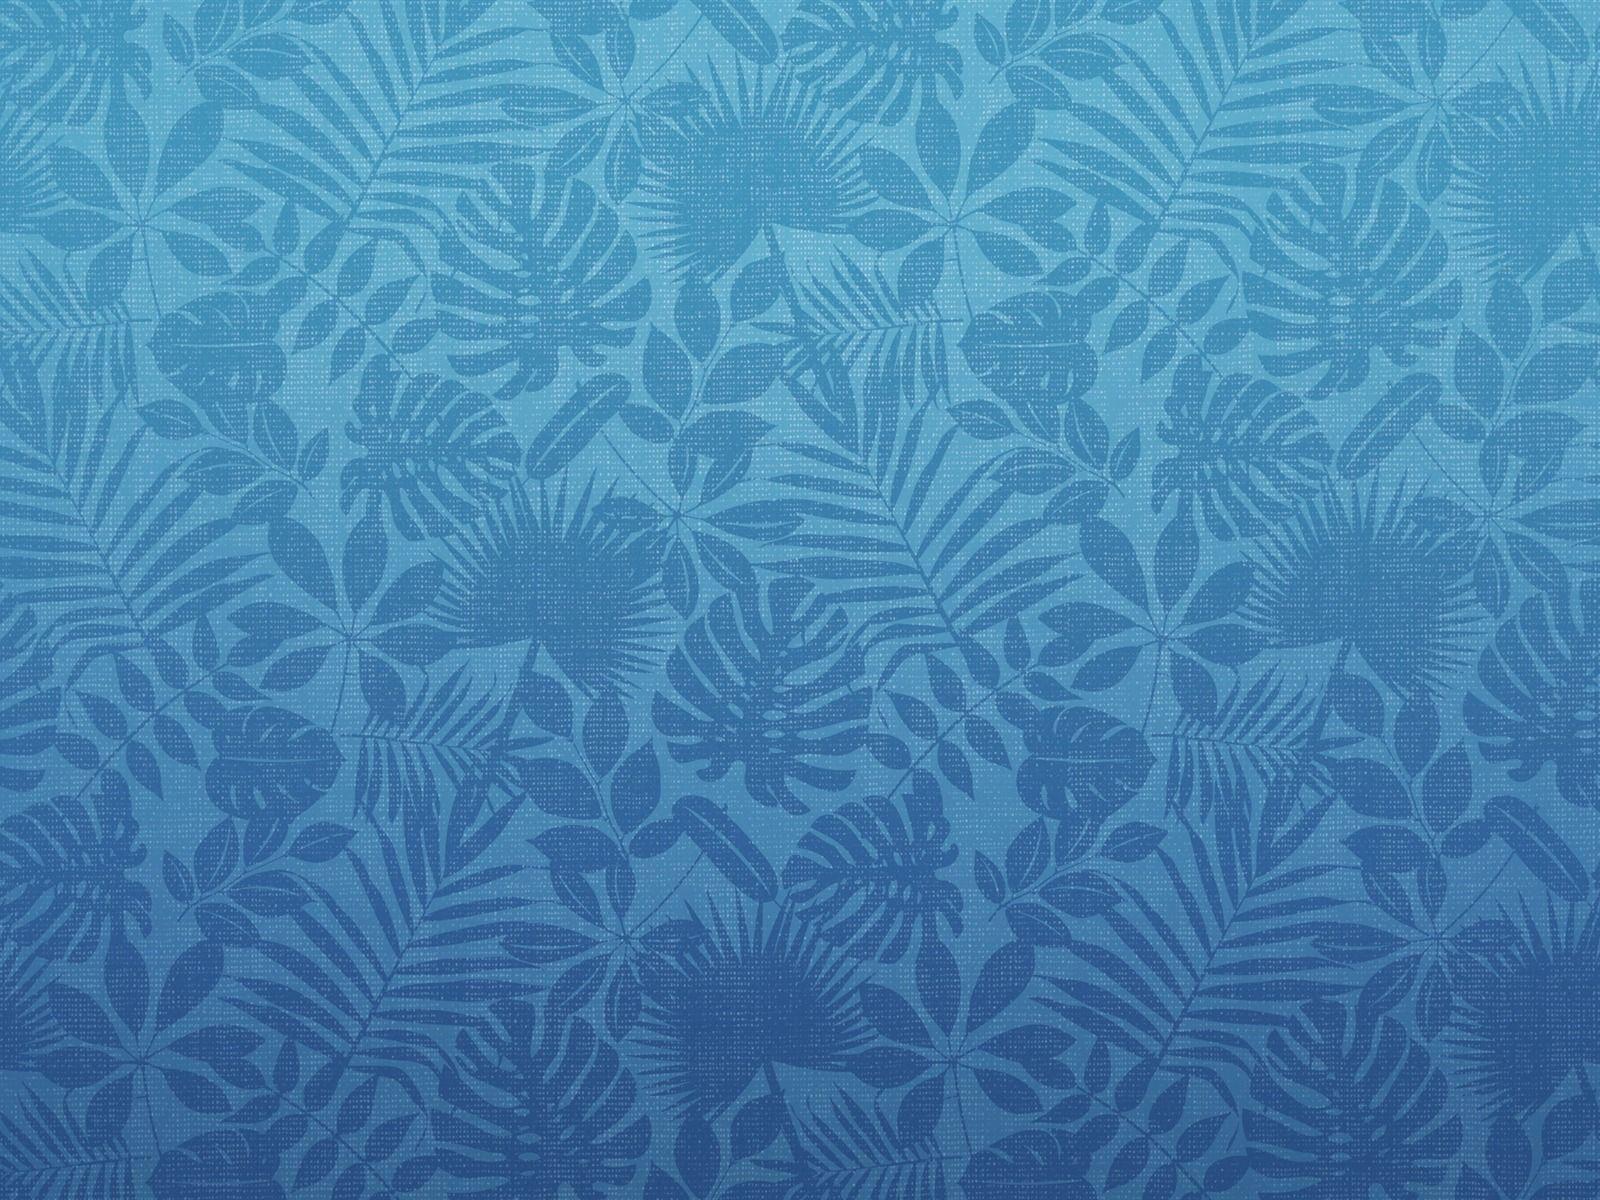 Blue Hawaiian printing-Mac OS Wallpaper - 1600x1200 wallpaper ...